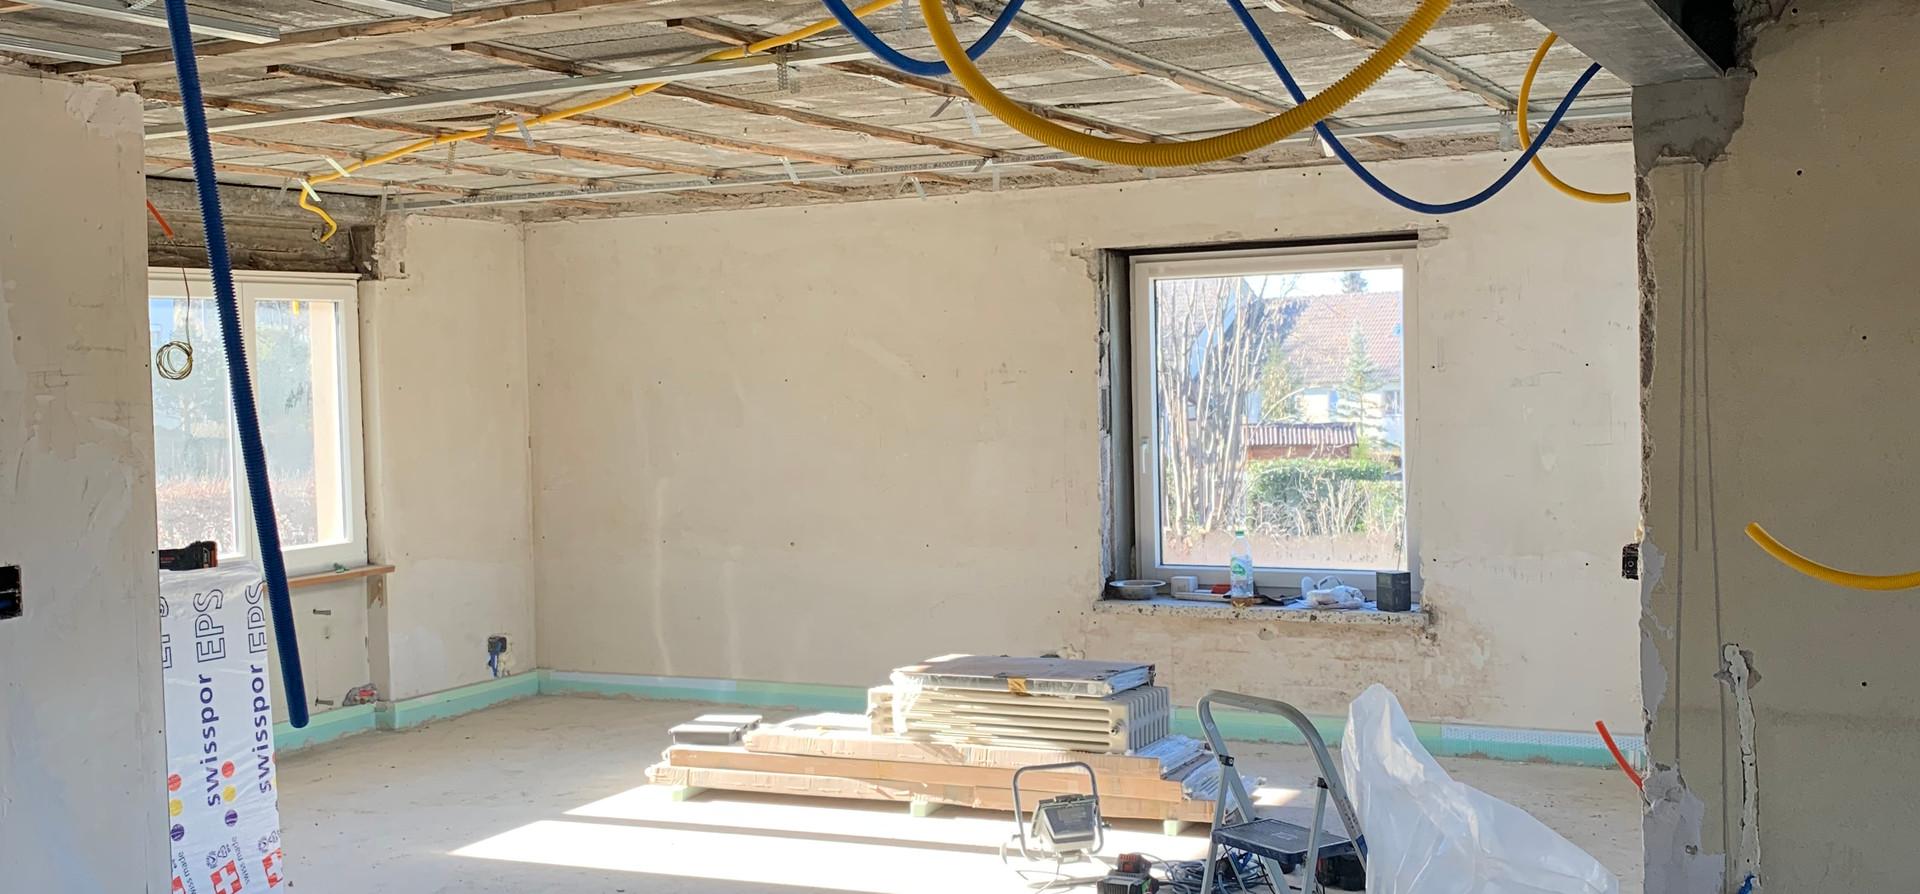 Wohnzimmer Umbaustand Februar 2020